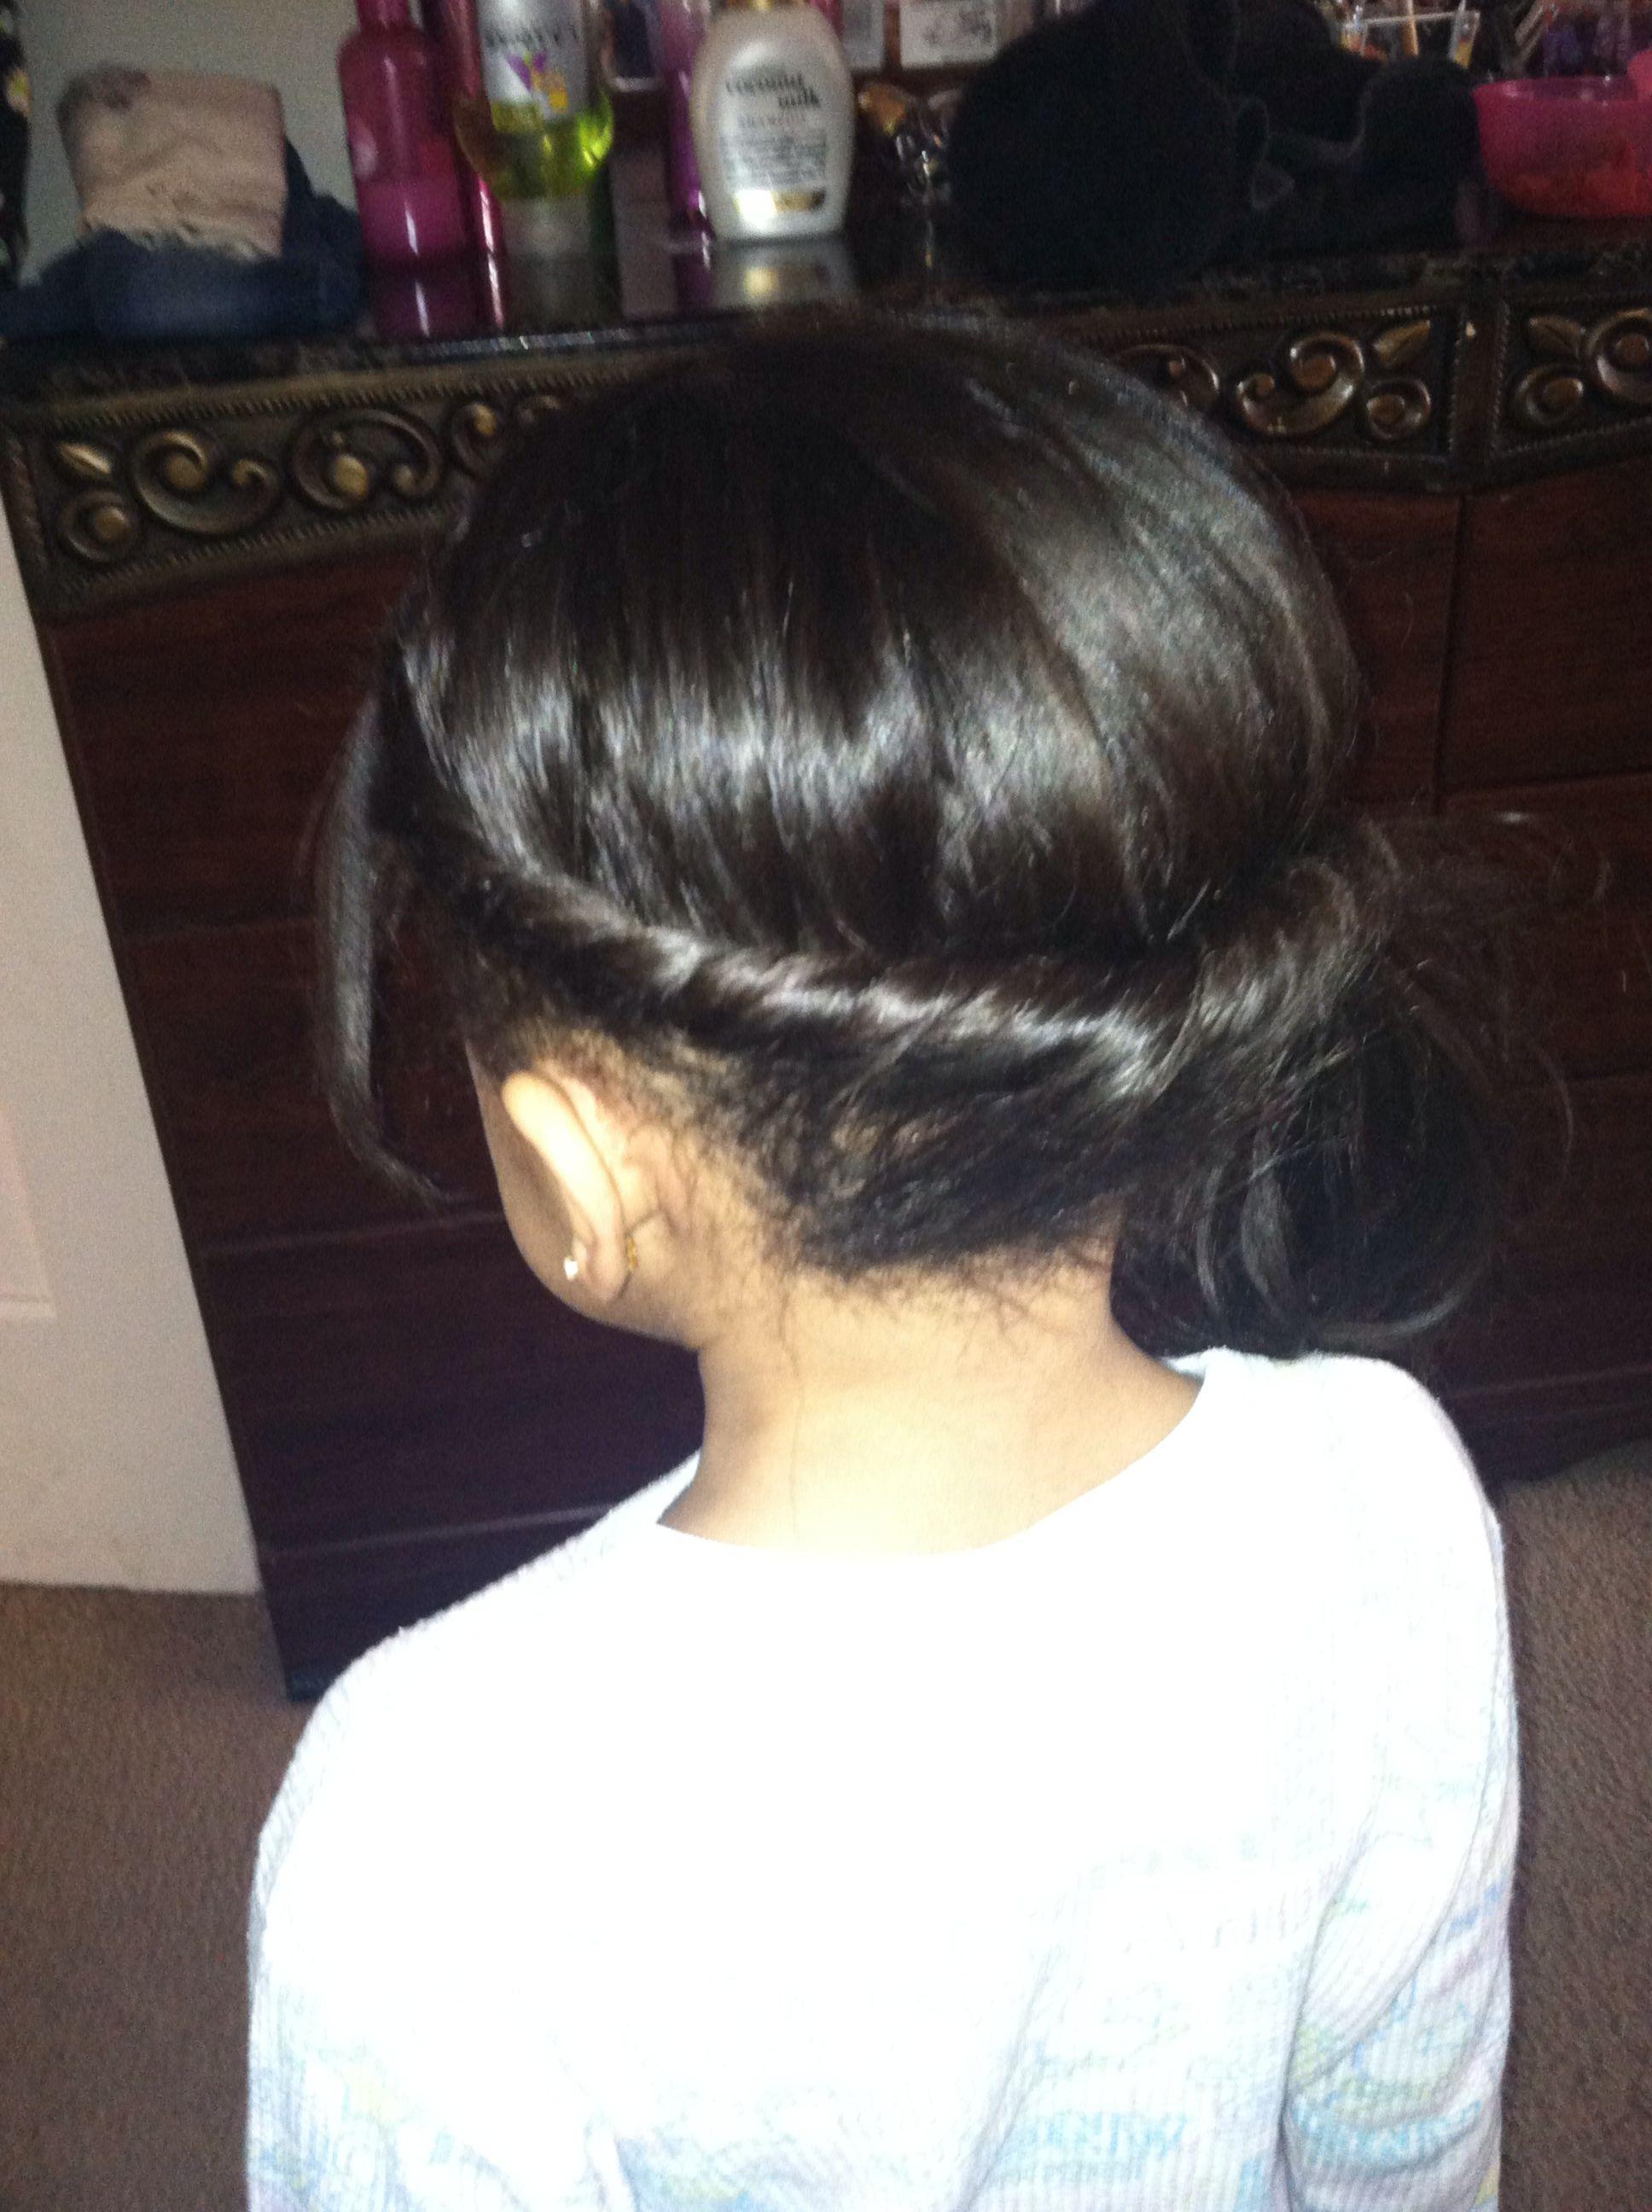 Baby hair creation.